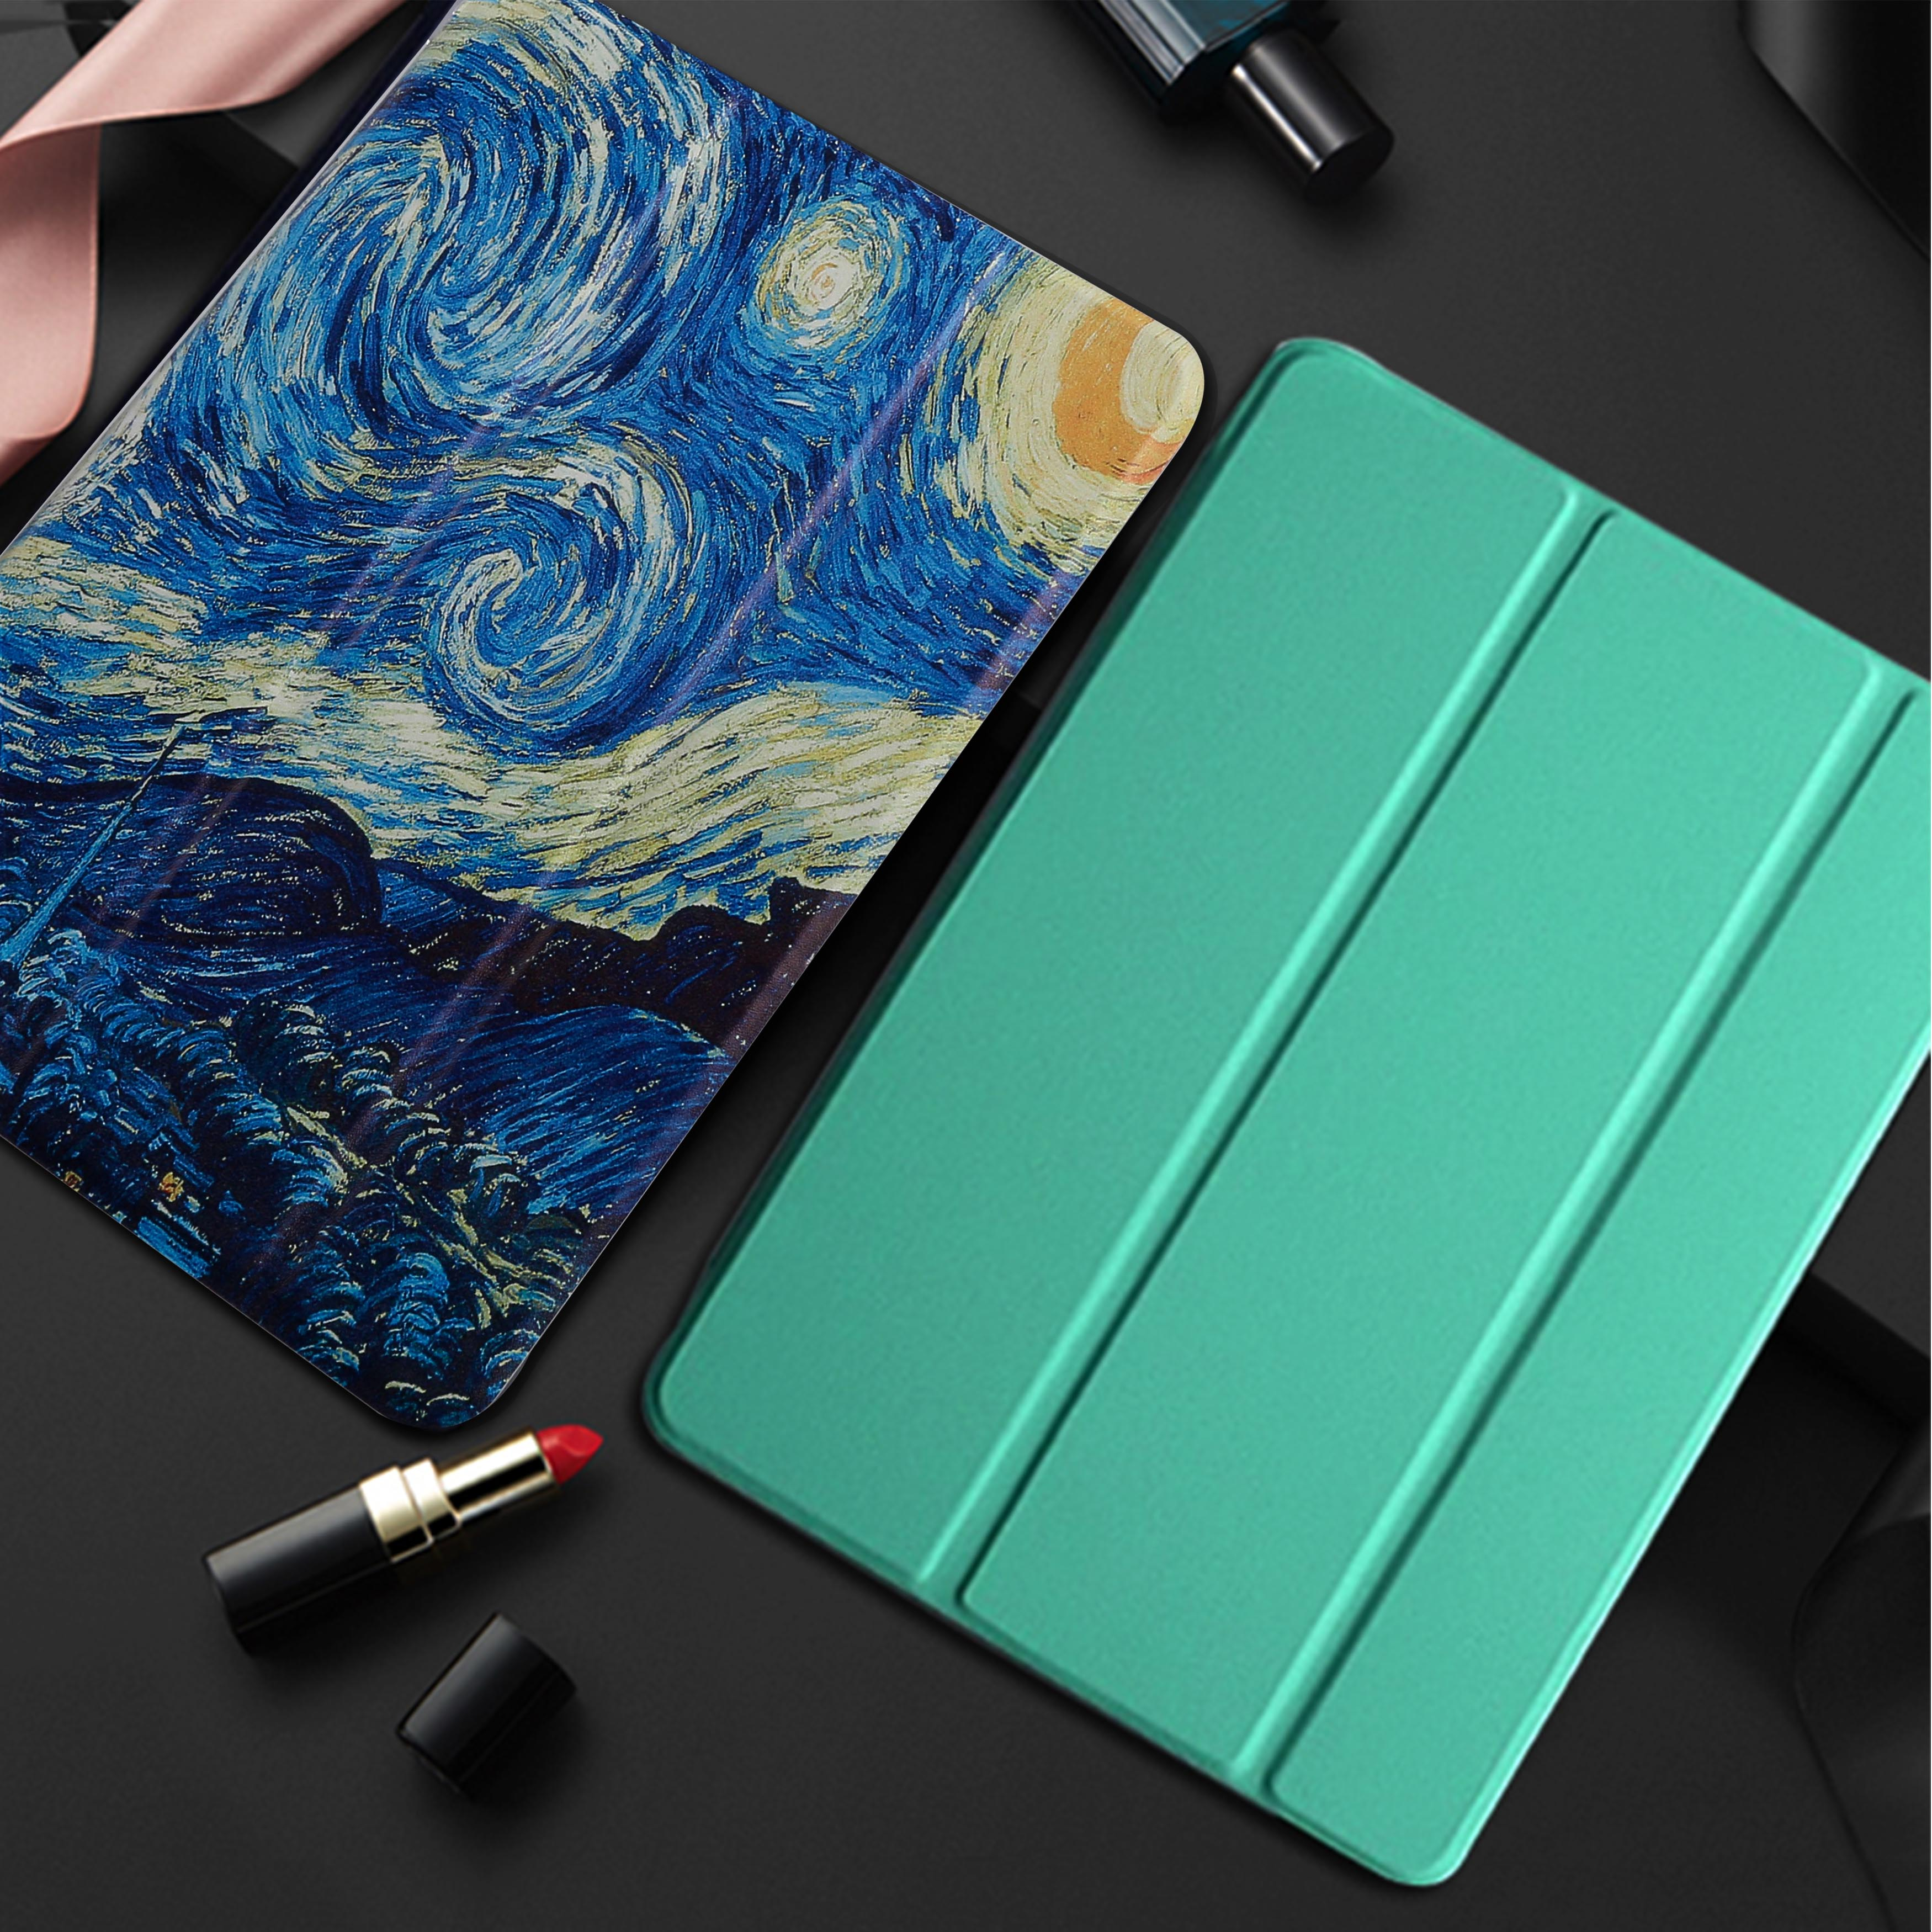 Tablet Case For Xiaomi Mi Pad 2 3 7.9 Inch Mipad 2 Mipad 3 7.9'' Fundas PU Ultra Slim Wake Smart Cover Case For Mi Pad2 Mi Pad3